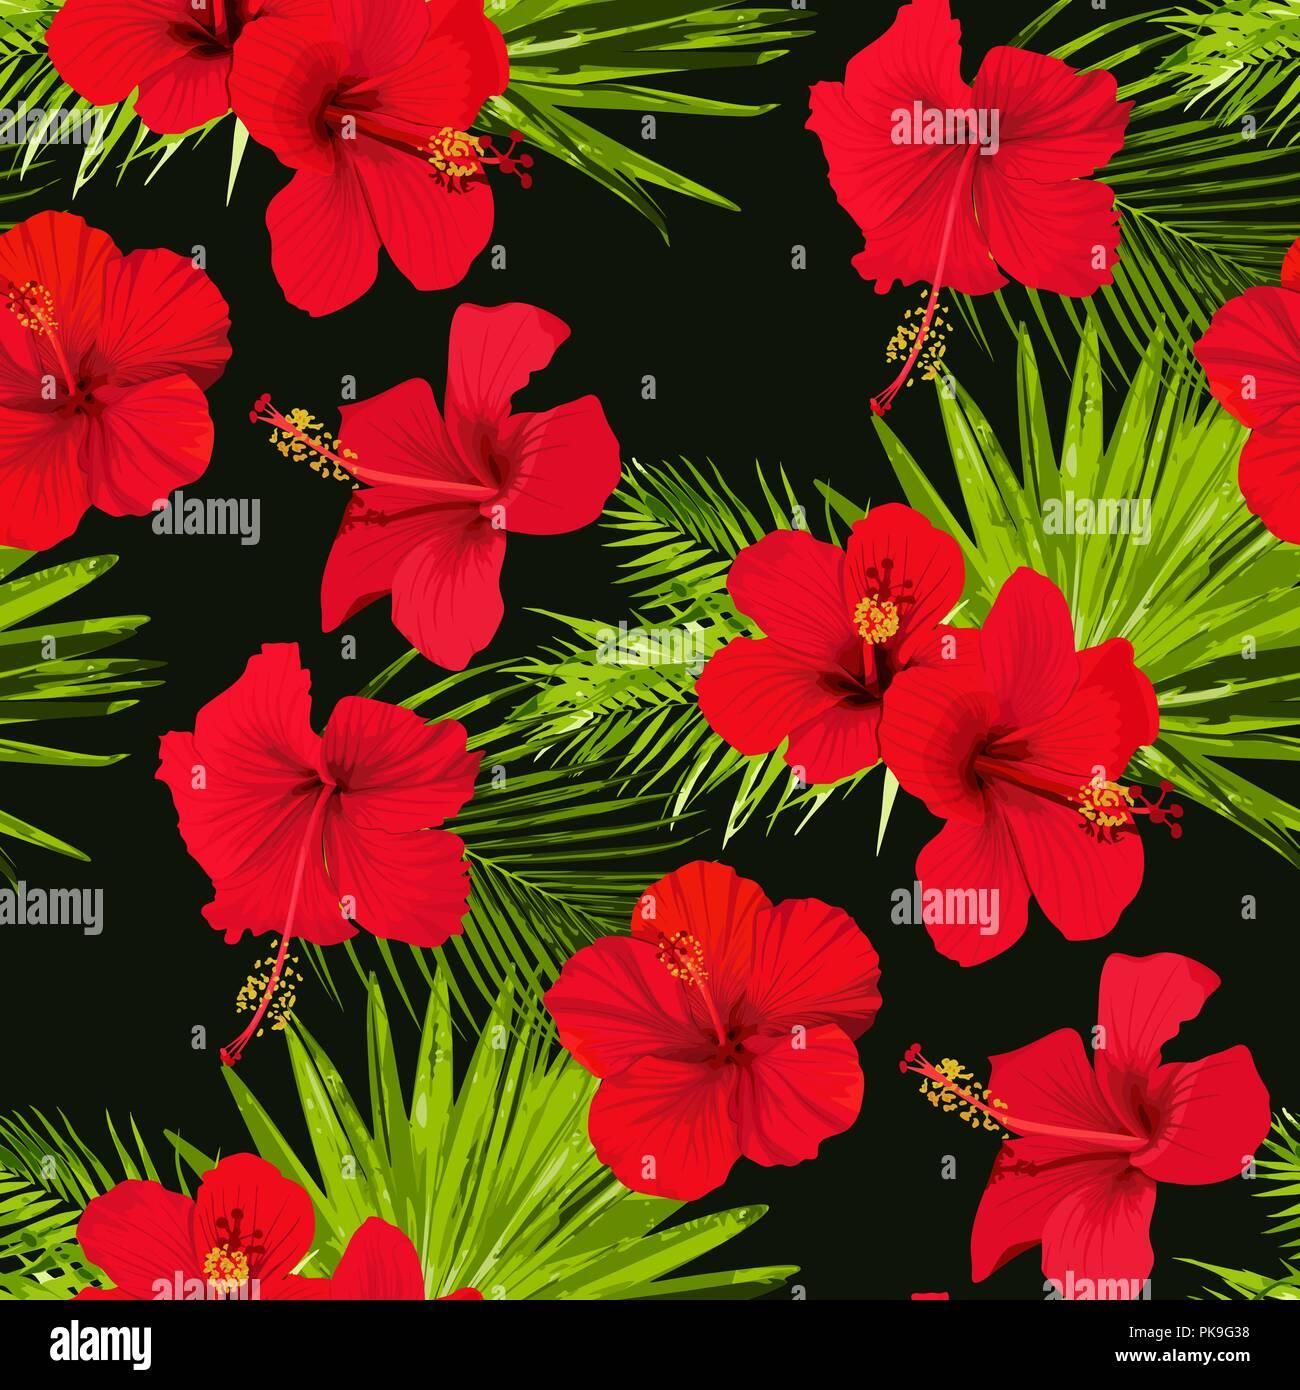 Hibiscus flower vector seamless pattern on a black background hibiscus flower vector seamless pattern on a black background flowered tropical texture izmirmasajfo